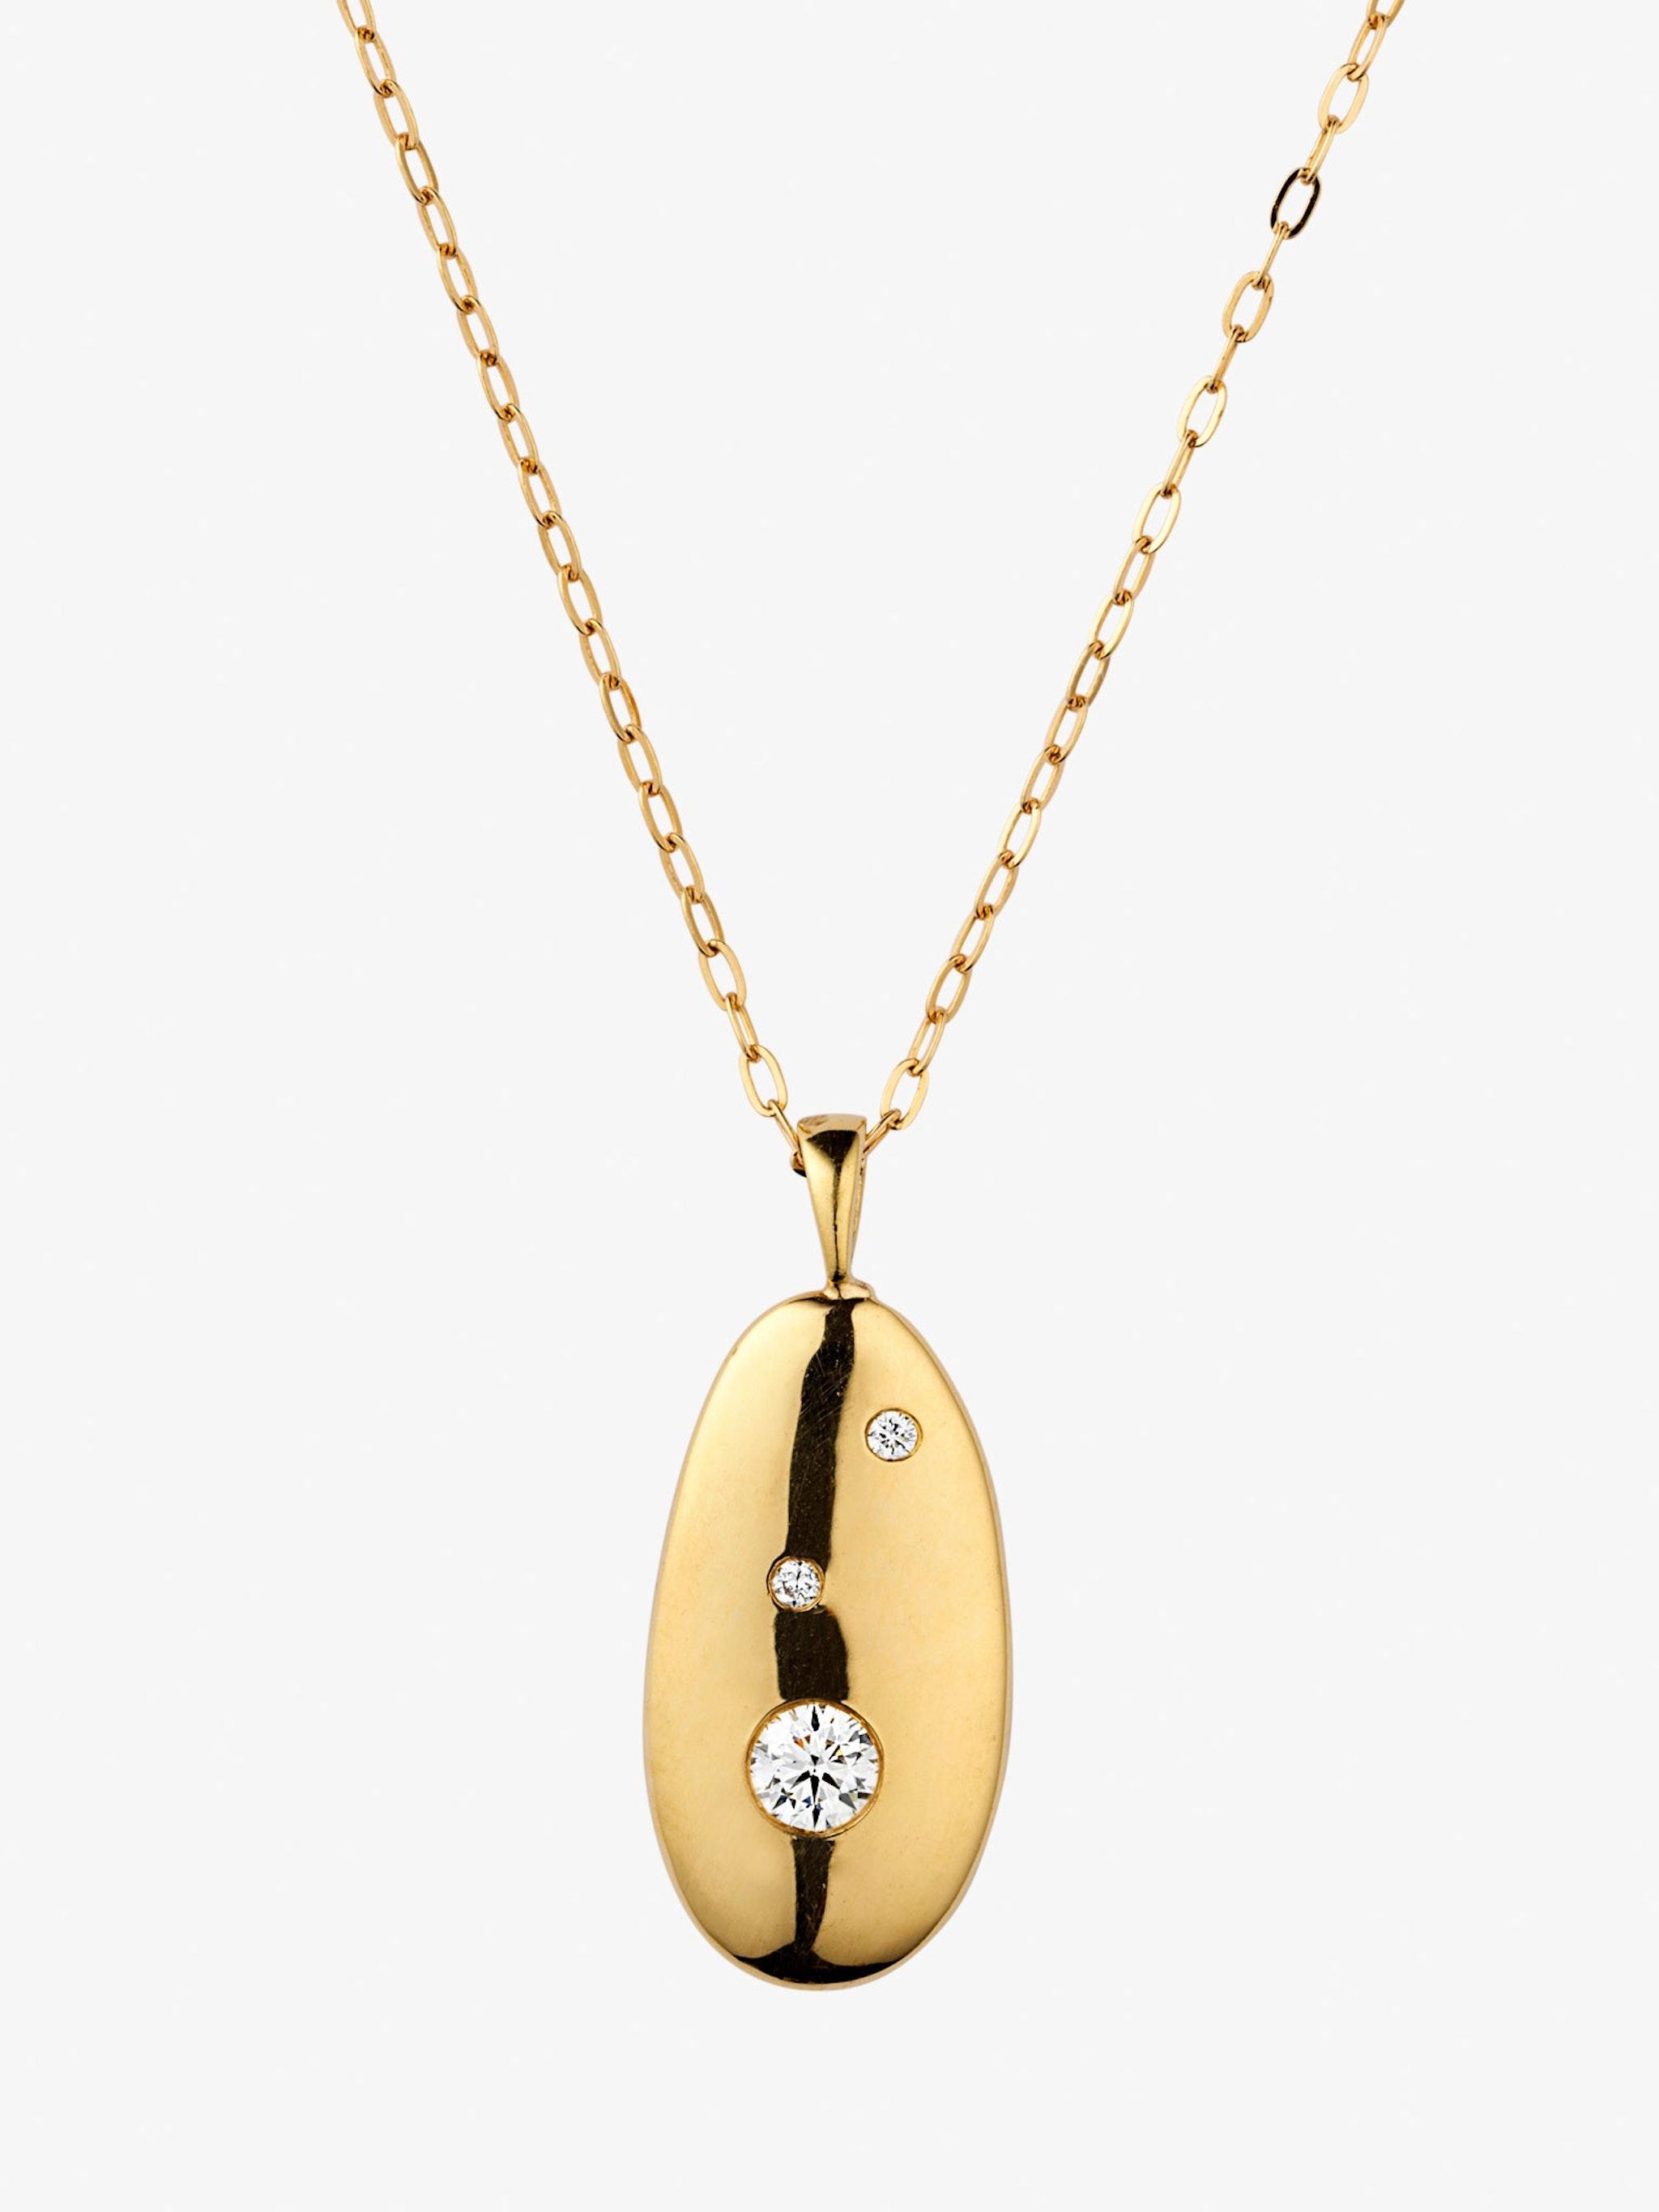 V1 gold and diamond necklace photo 3